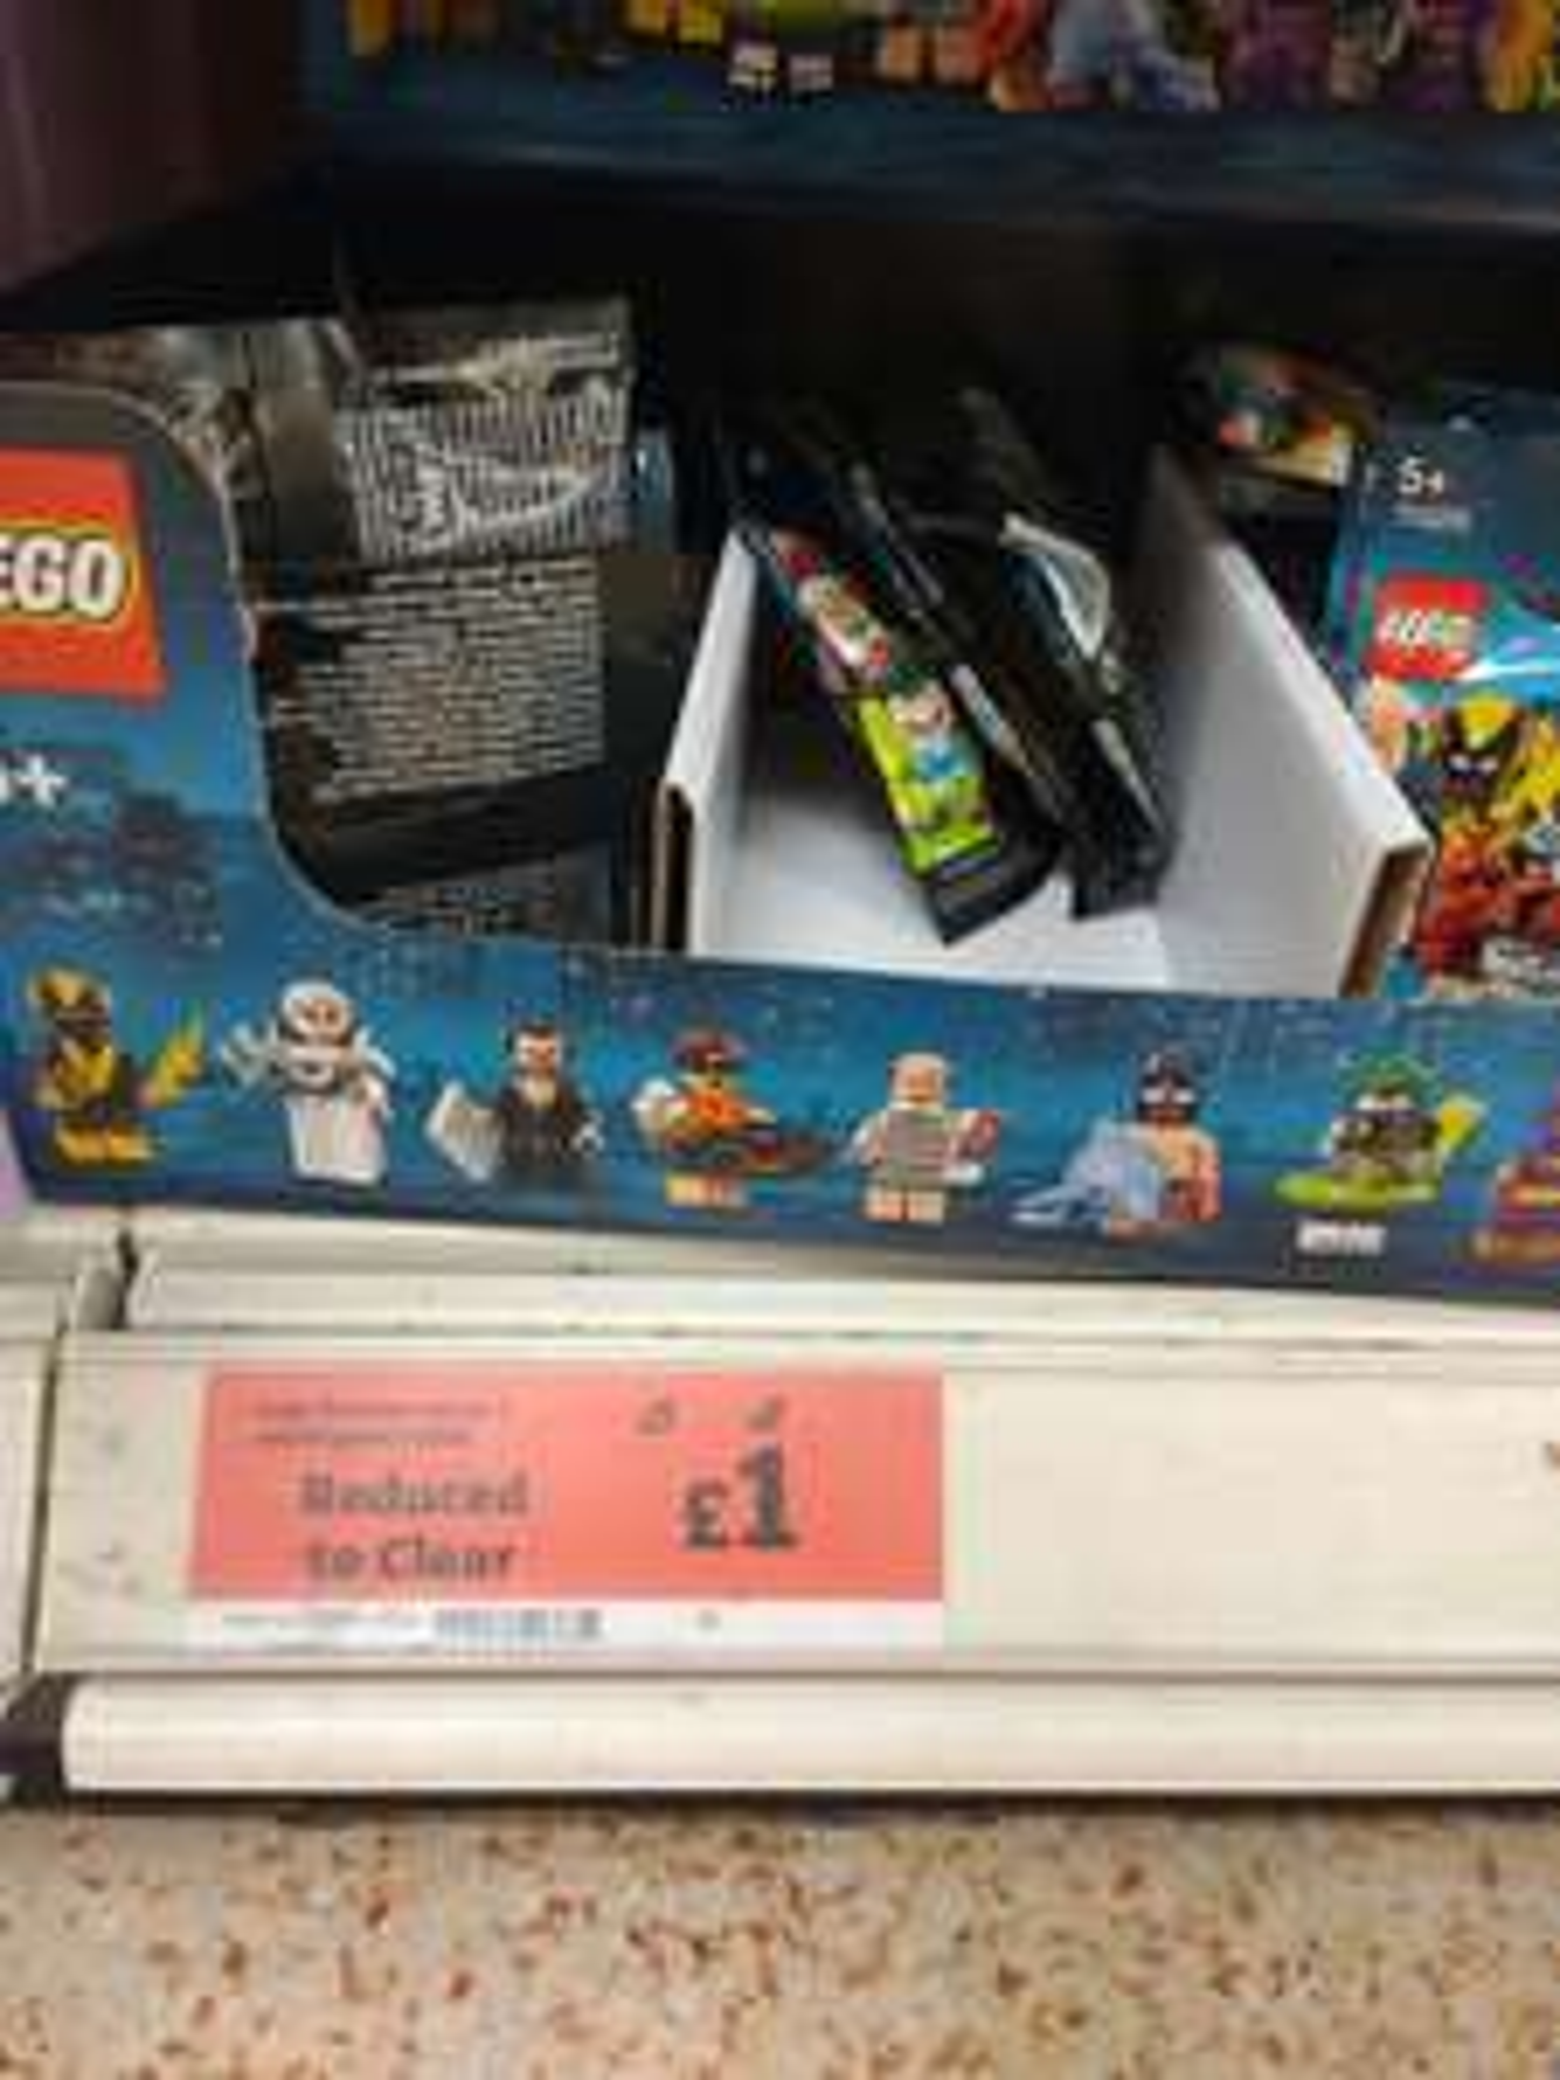 Lego batman series 2 mini figures £1 instore @ Sainsbury's Halstead